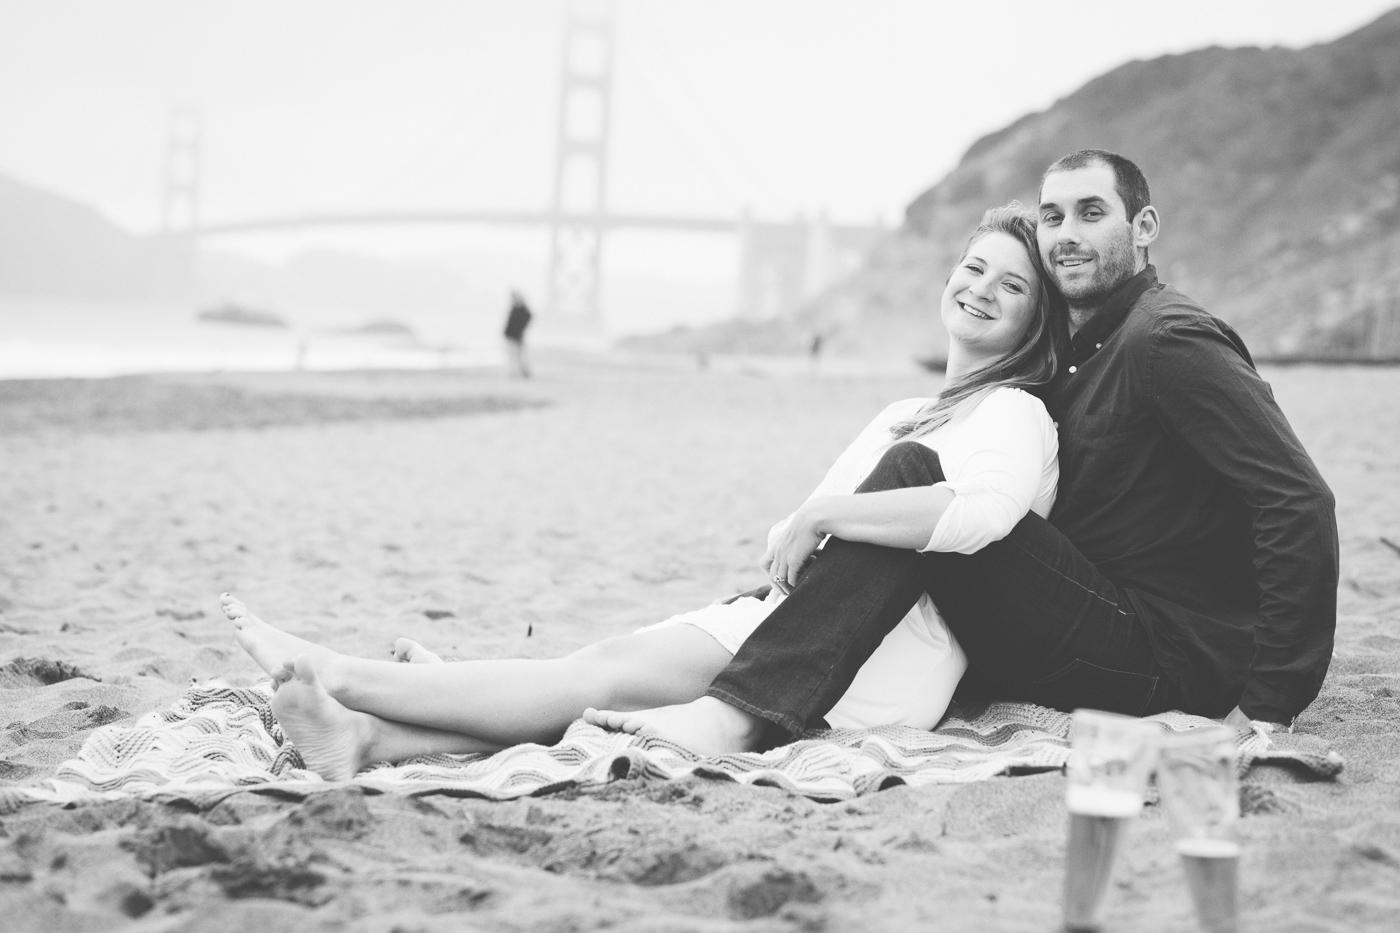 Baker-beach-san-francisco-california-engagement-session-11.jpg